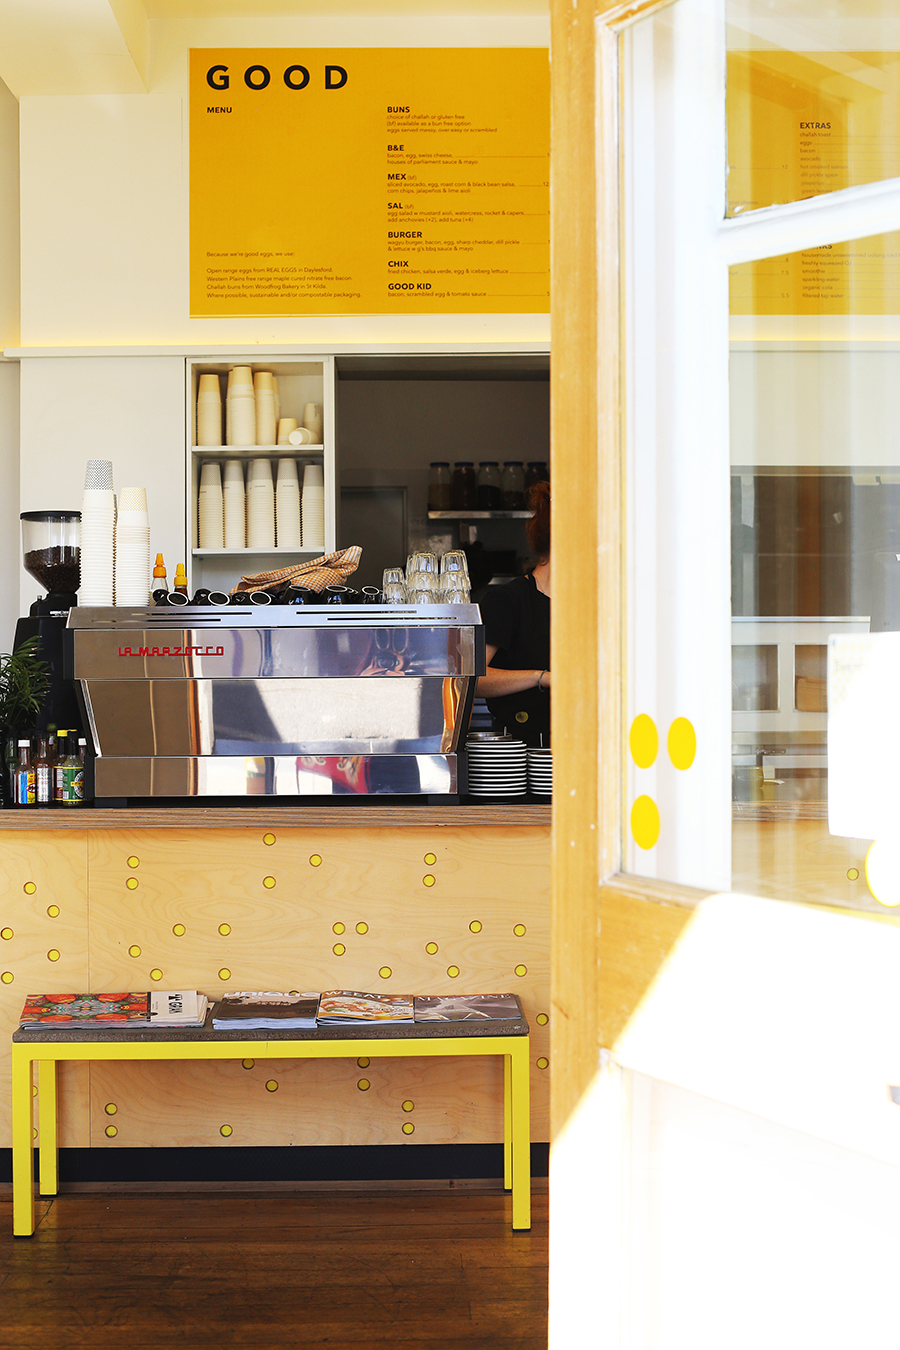 Melbourne, Australia: 11 Restaurants, Bars, & Cafes to Try  Hash Specialty Coffee & Roasters, Market Lane Coffee, Chez Dre, Bibelot, Good Egg, Il Fornaio, Matcha Mylkbar, Lui Bar, The Waiting Room, Rockpool Bar & Grill, Dinner by Heston Blumenthal